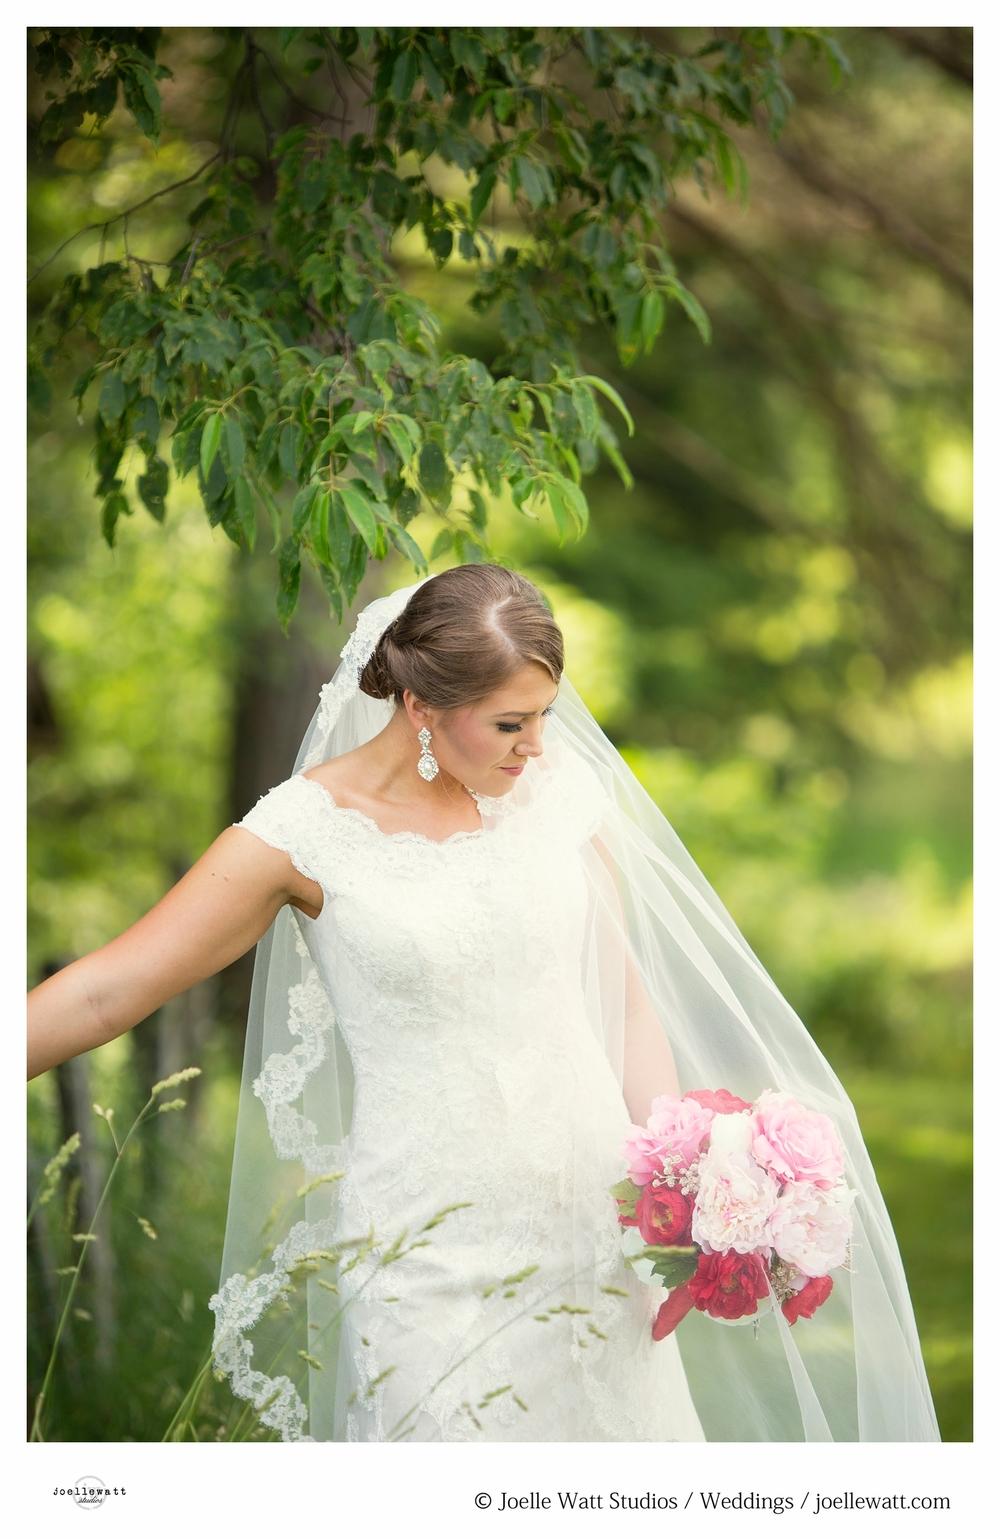 Terwiske Wedding 8.jpg